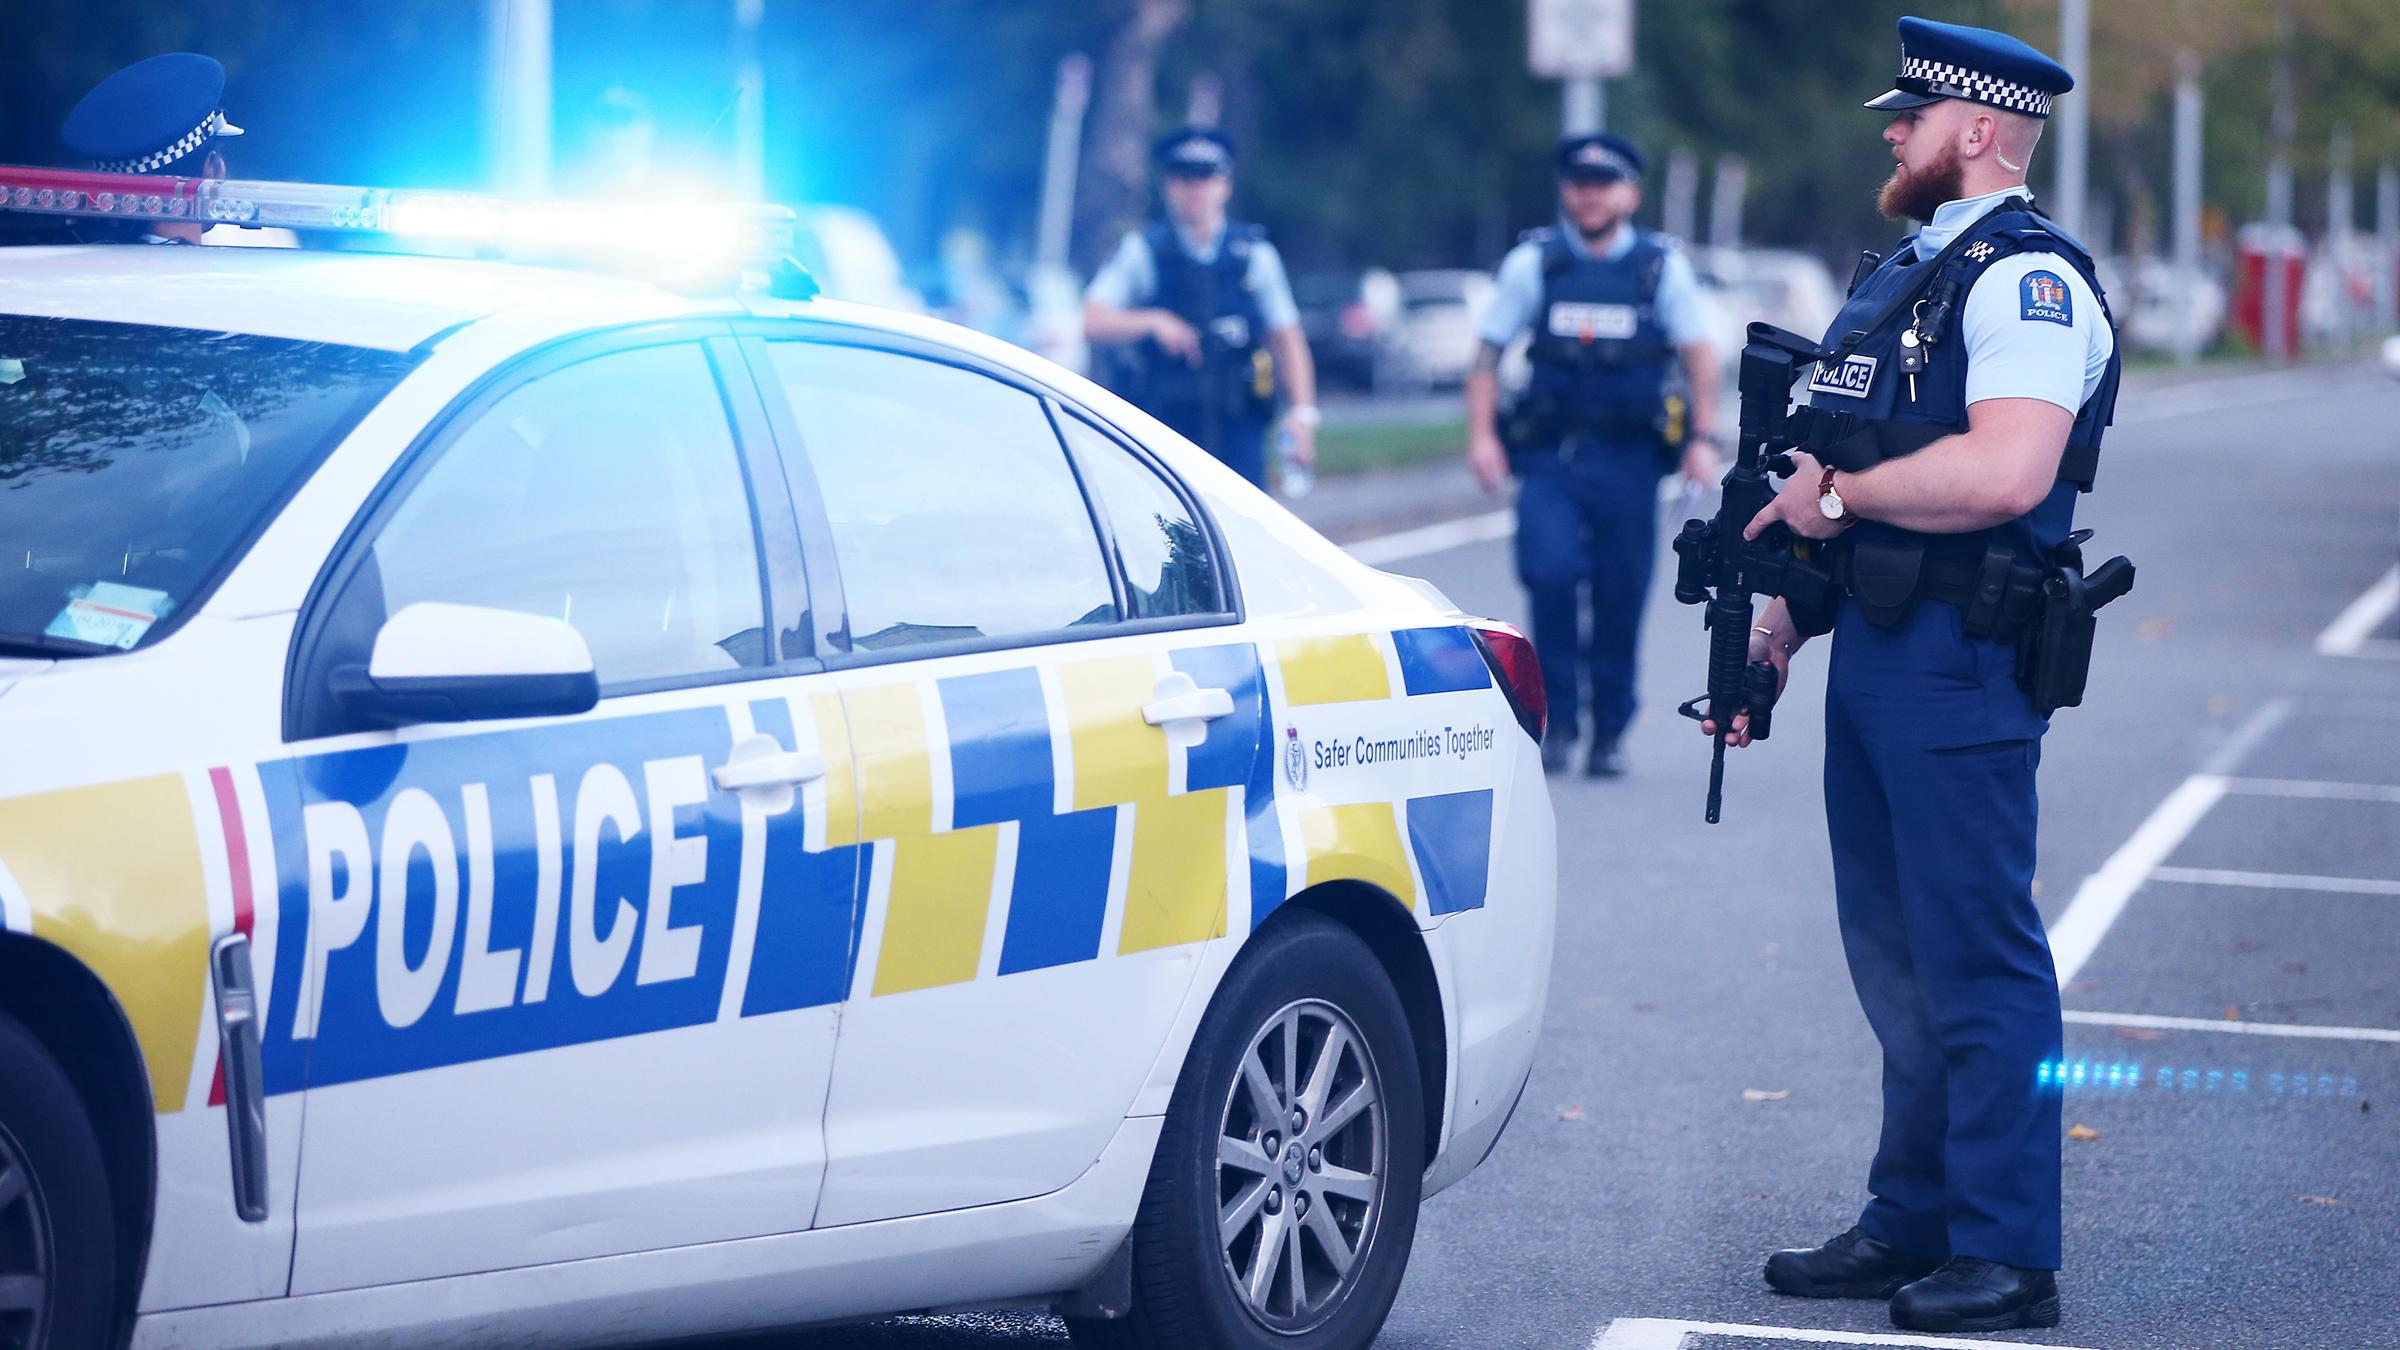 New Zealand Mass Shooting Update: Number Of Dead Rises To 50 In New Zealand Mass Shooting